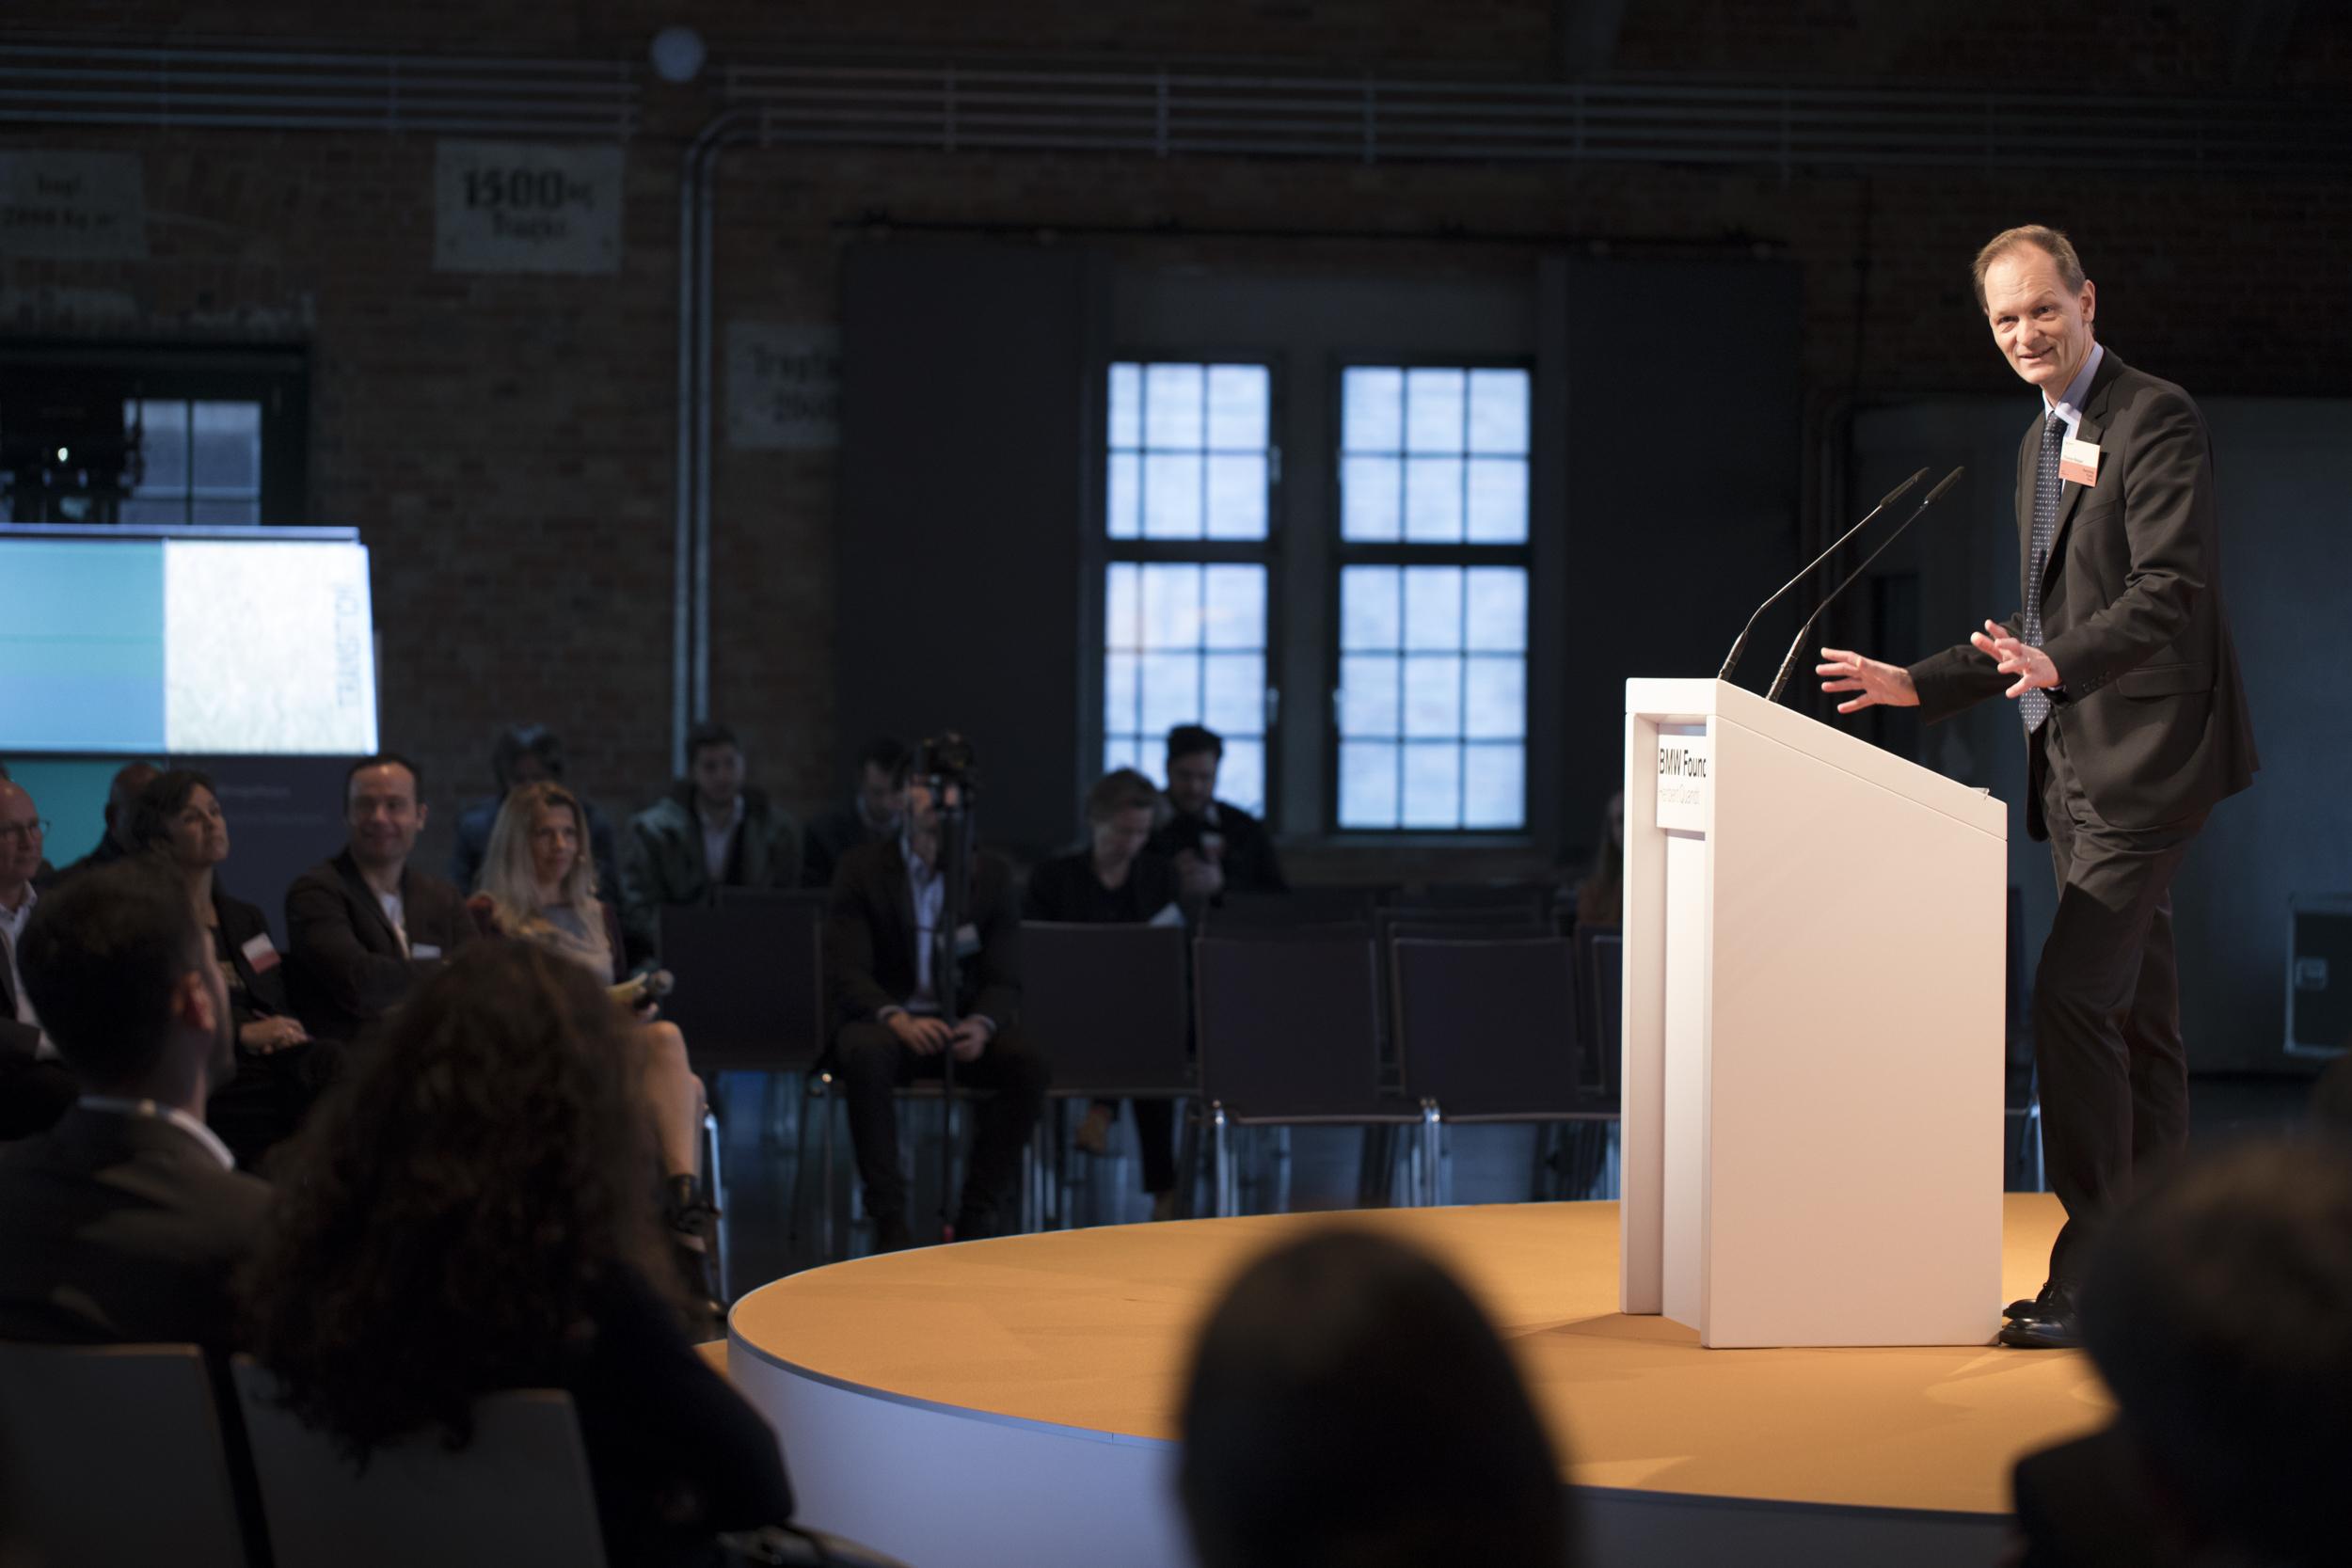 BerlinGlobalForum_17__CL_8982_Claudia Leisinger.jpg